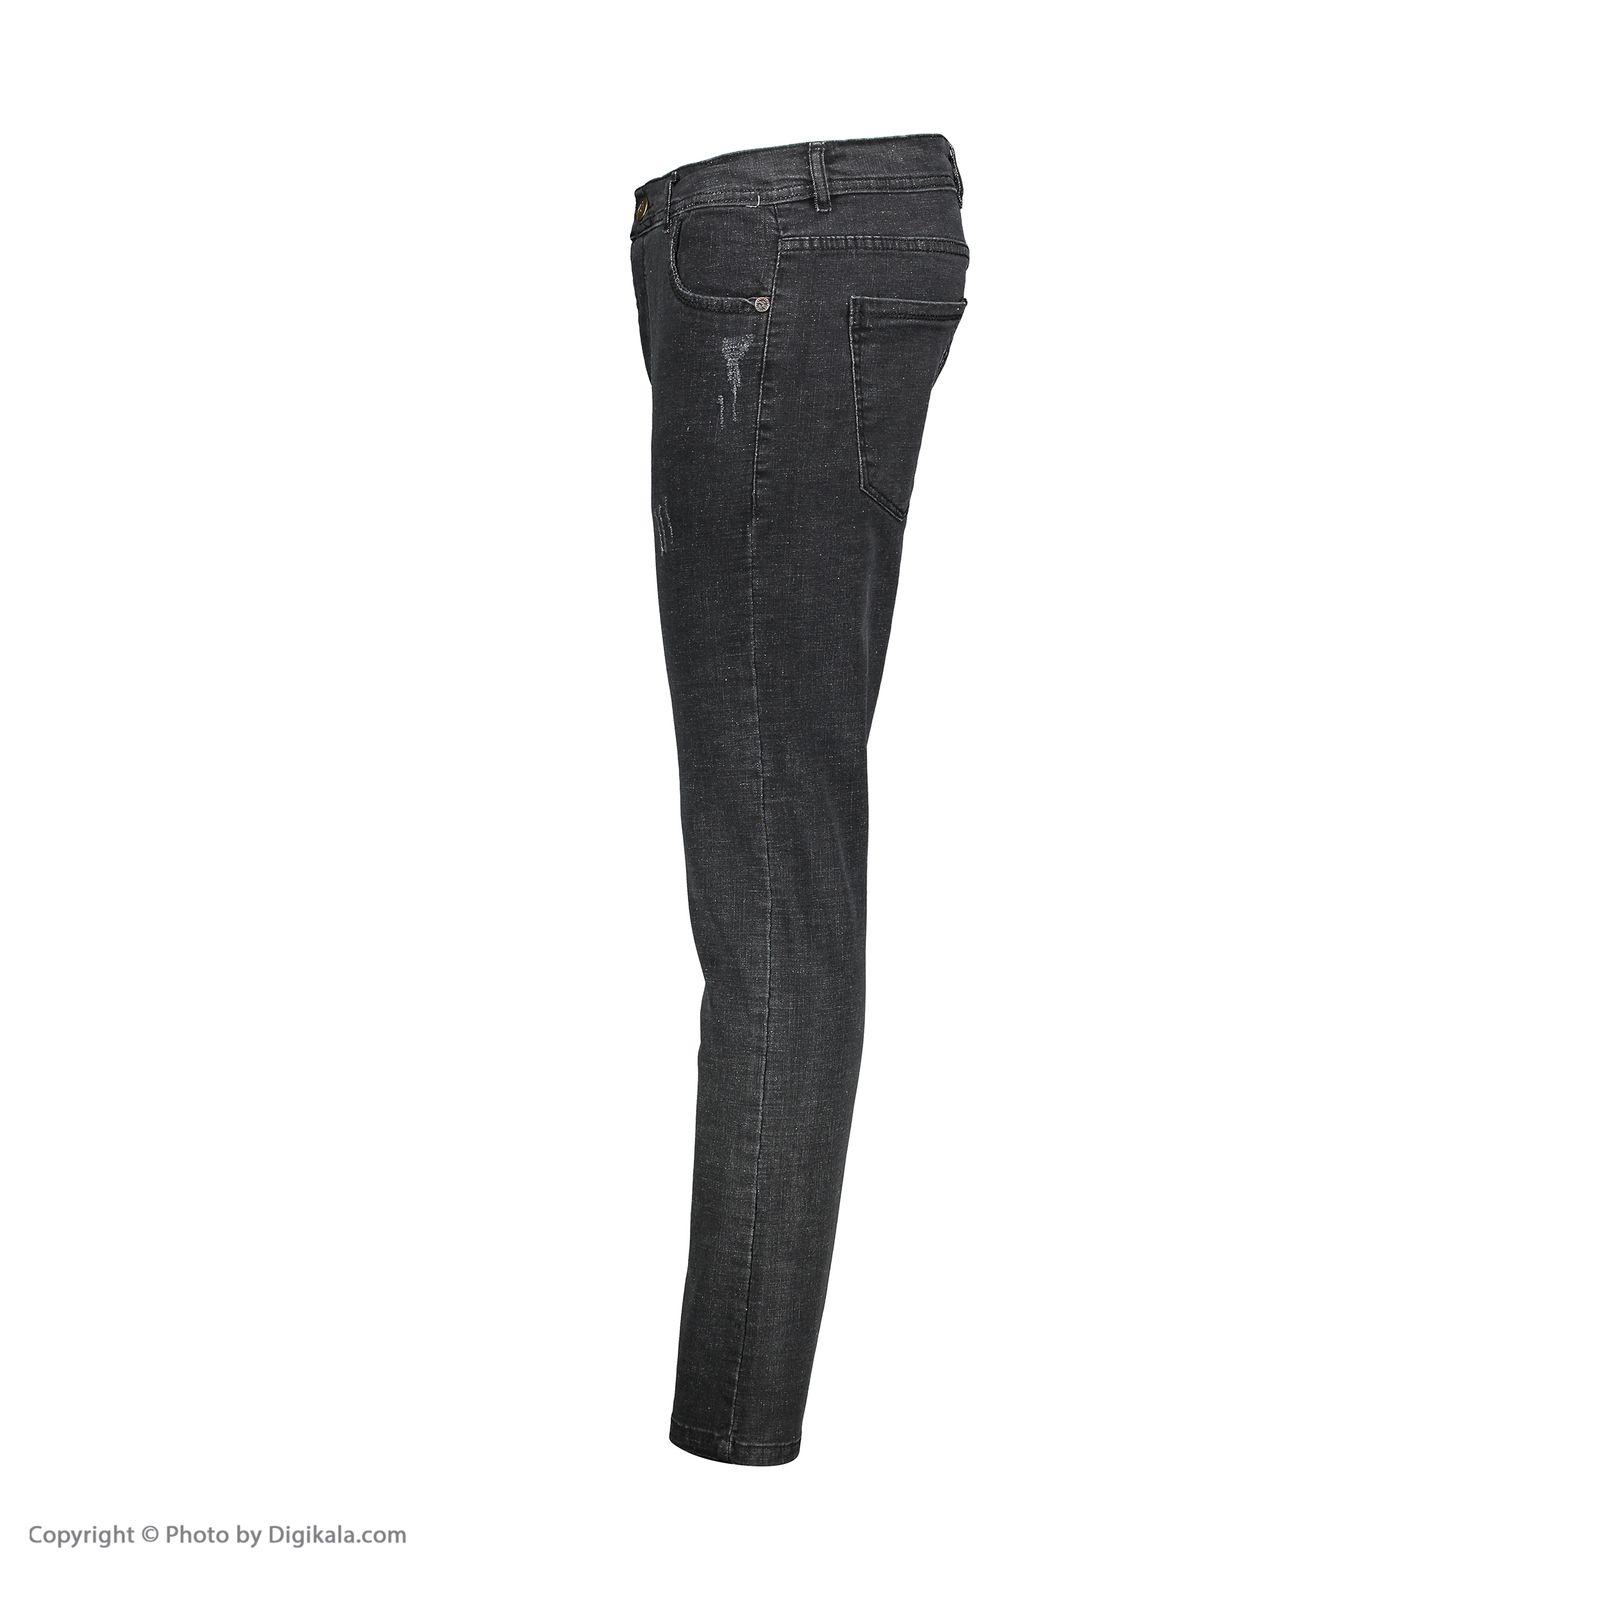 شلوار جین مردانه مدل CRS-02A main 1 2